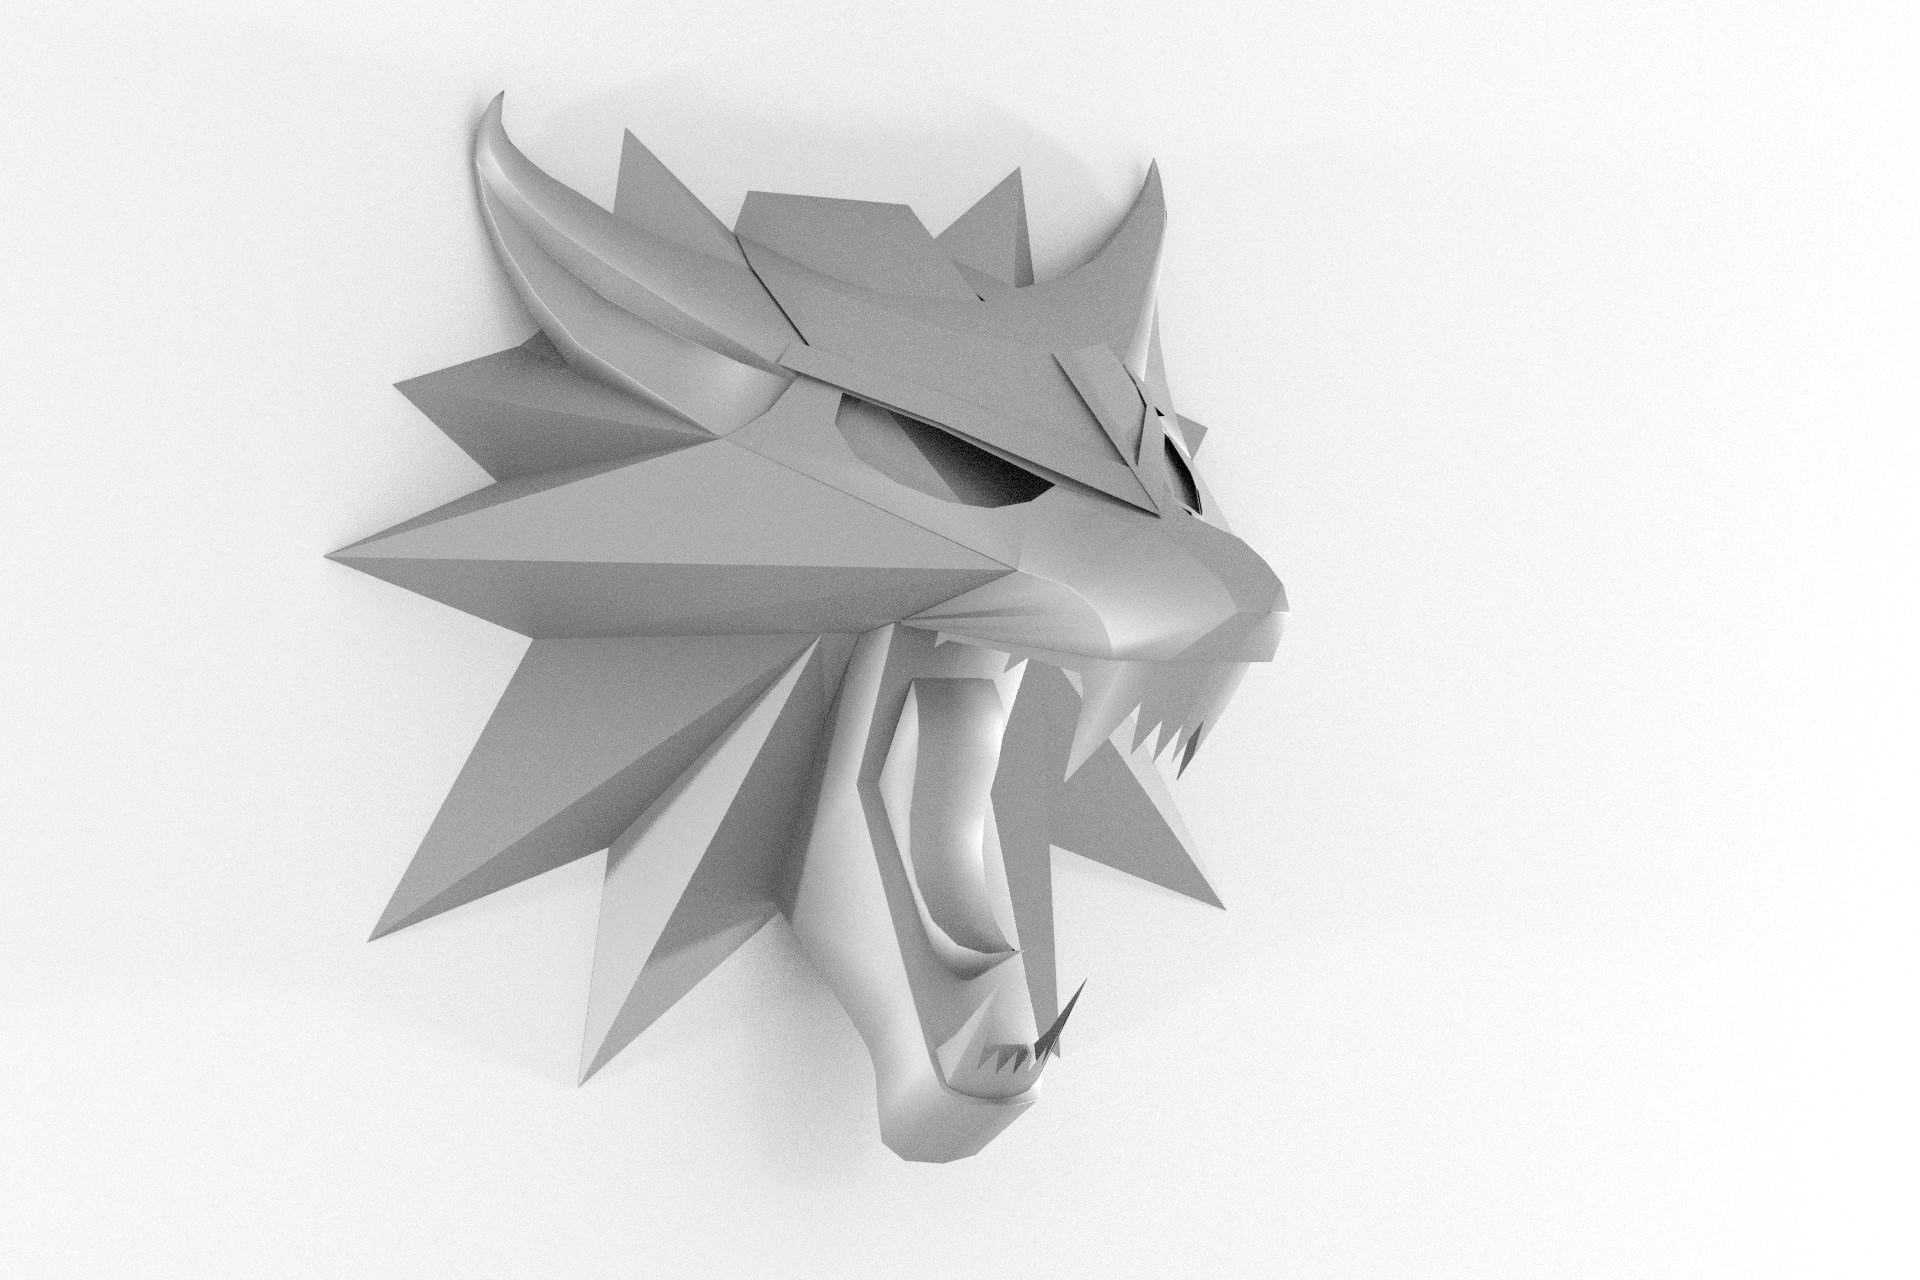 Wolf Wandtrophäe aus Papier